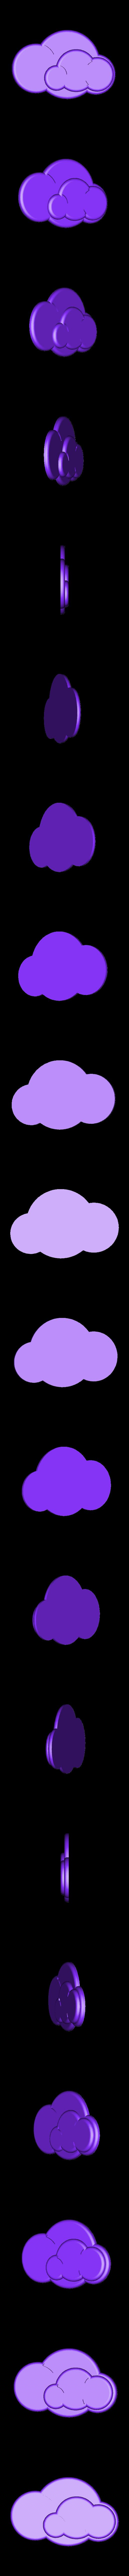 "Cloudy.stl Download free STL file Al Roker's ""Weather Magnets"" • 3D print design, GeneralElectric"